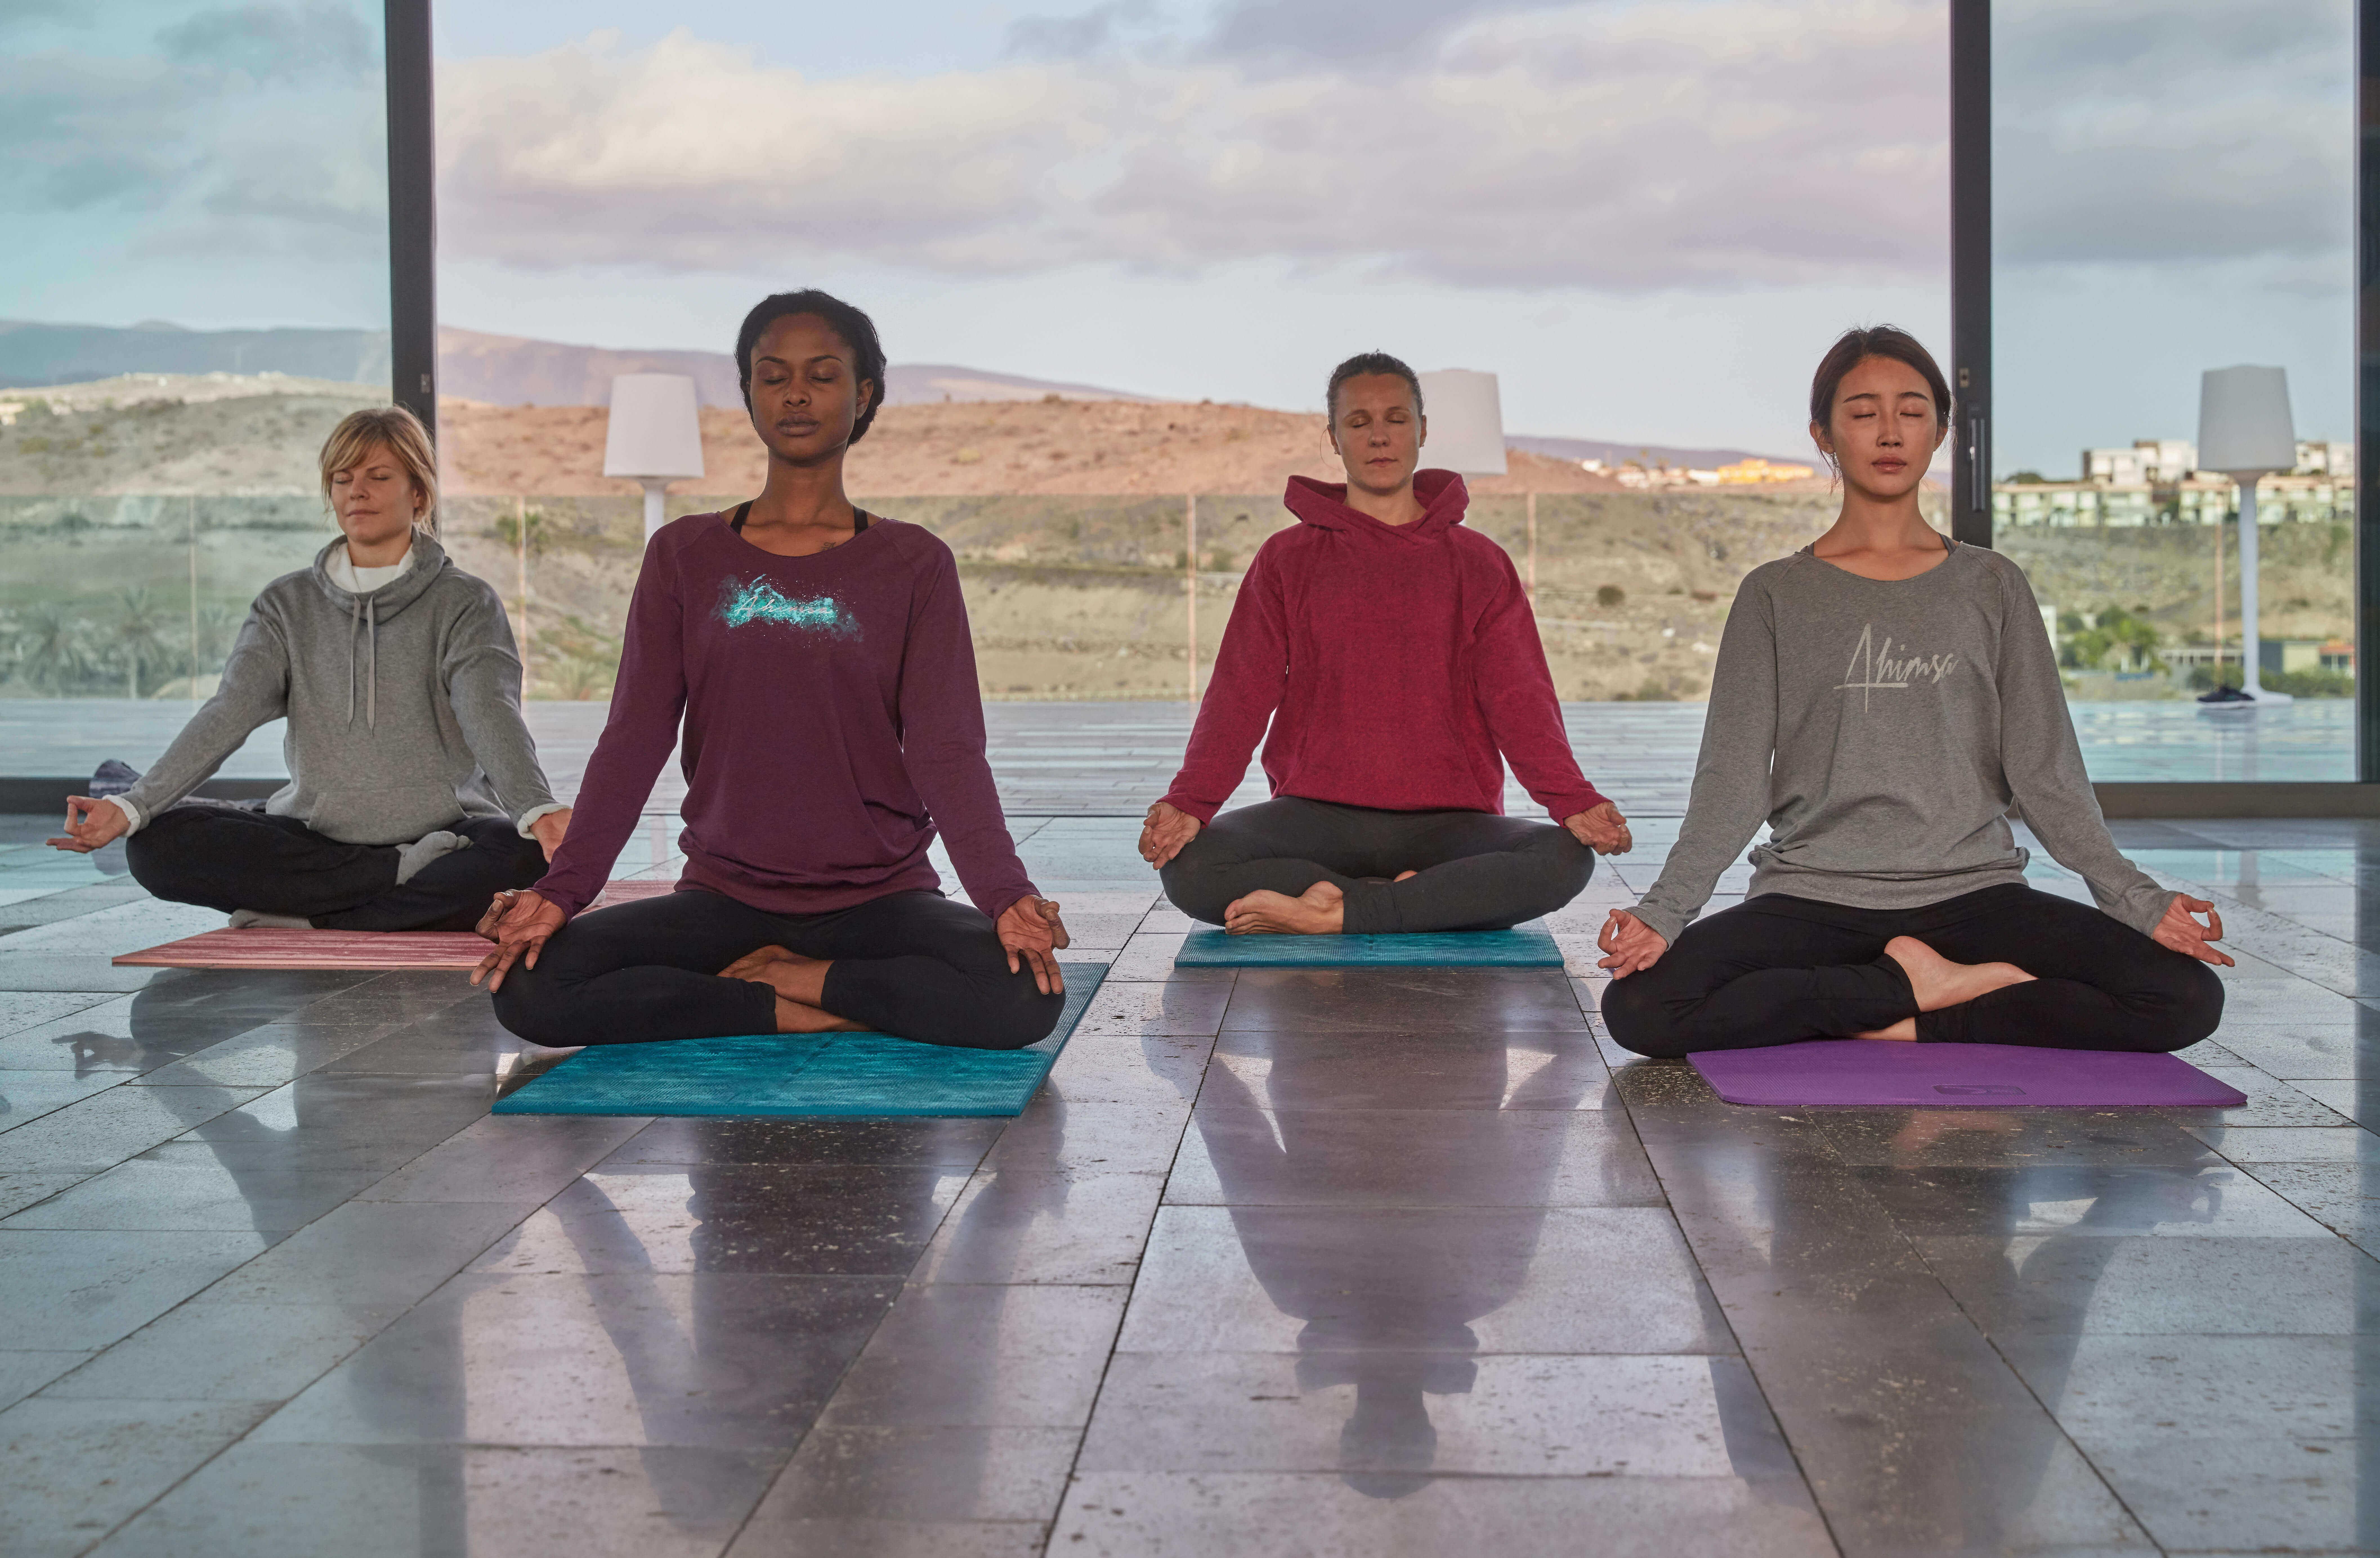 Padmasana Benefits | Padmasana Yoga and Its Benefits | Blog Decathlon